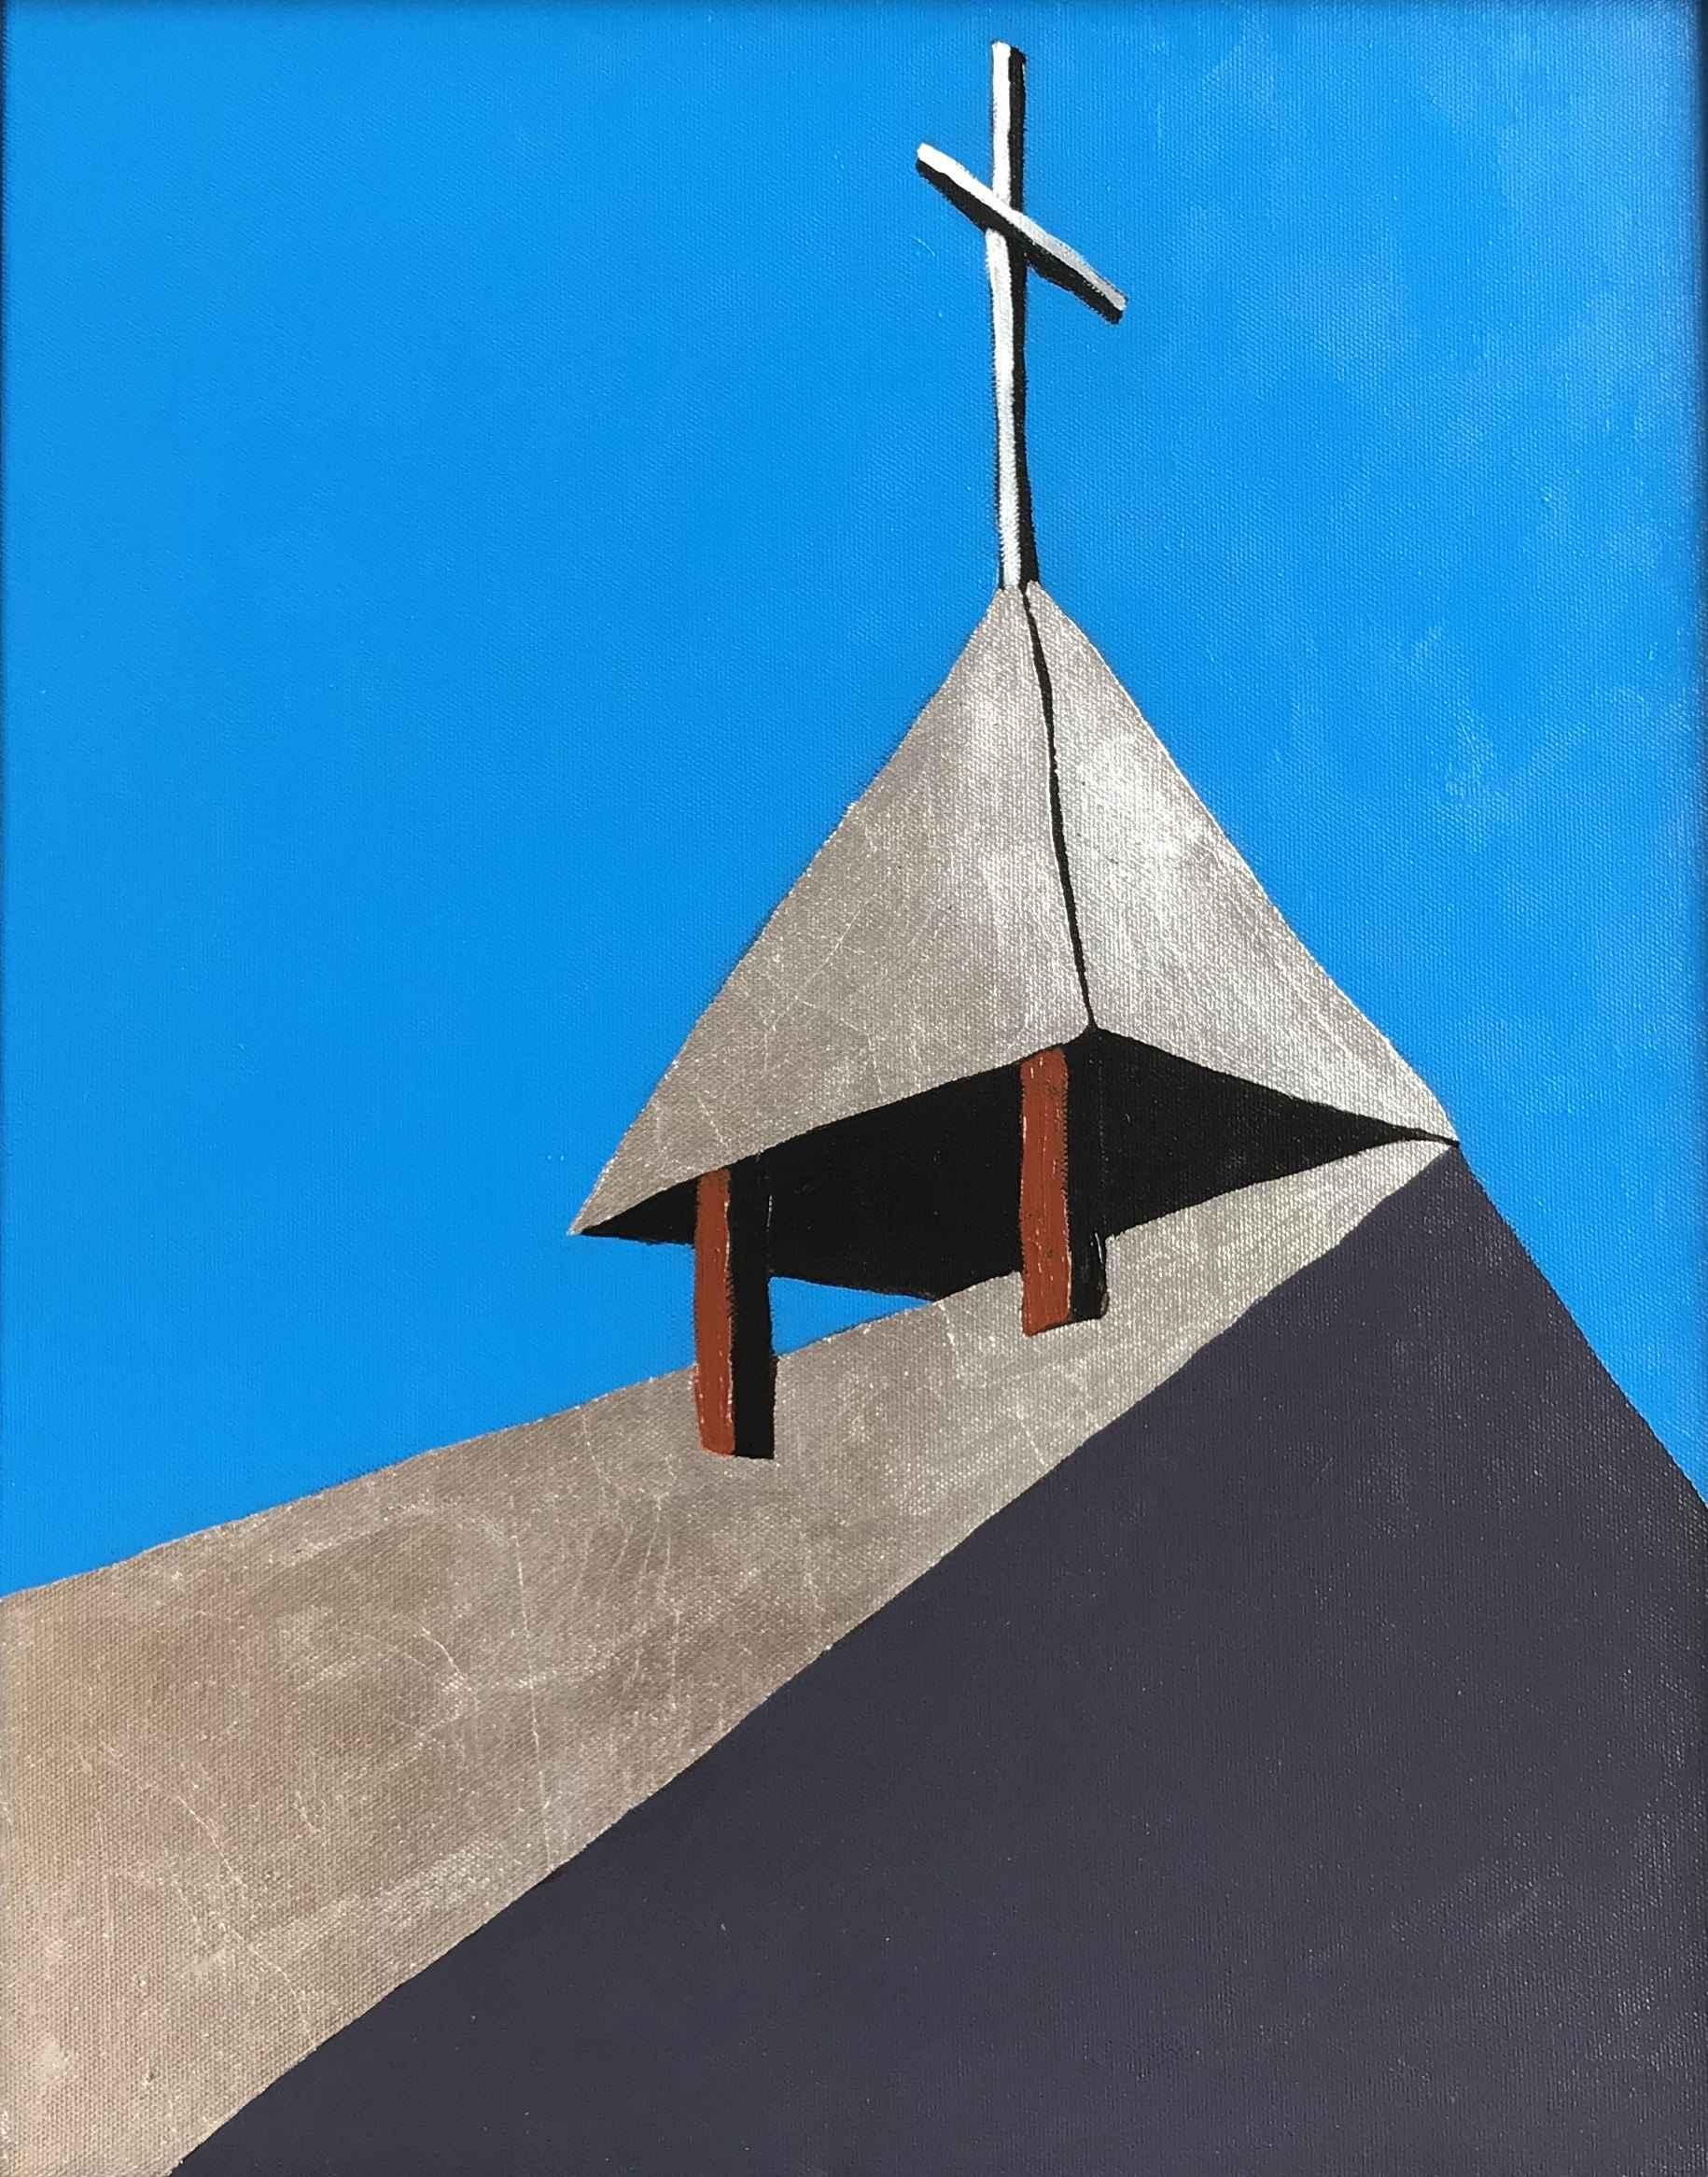 Norteno by  Alvin Gill-Tapia - Masterpiece Online